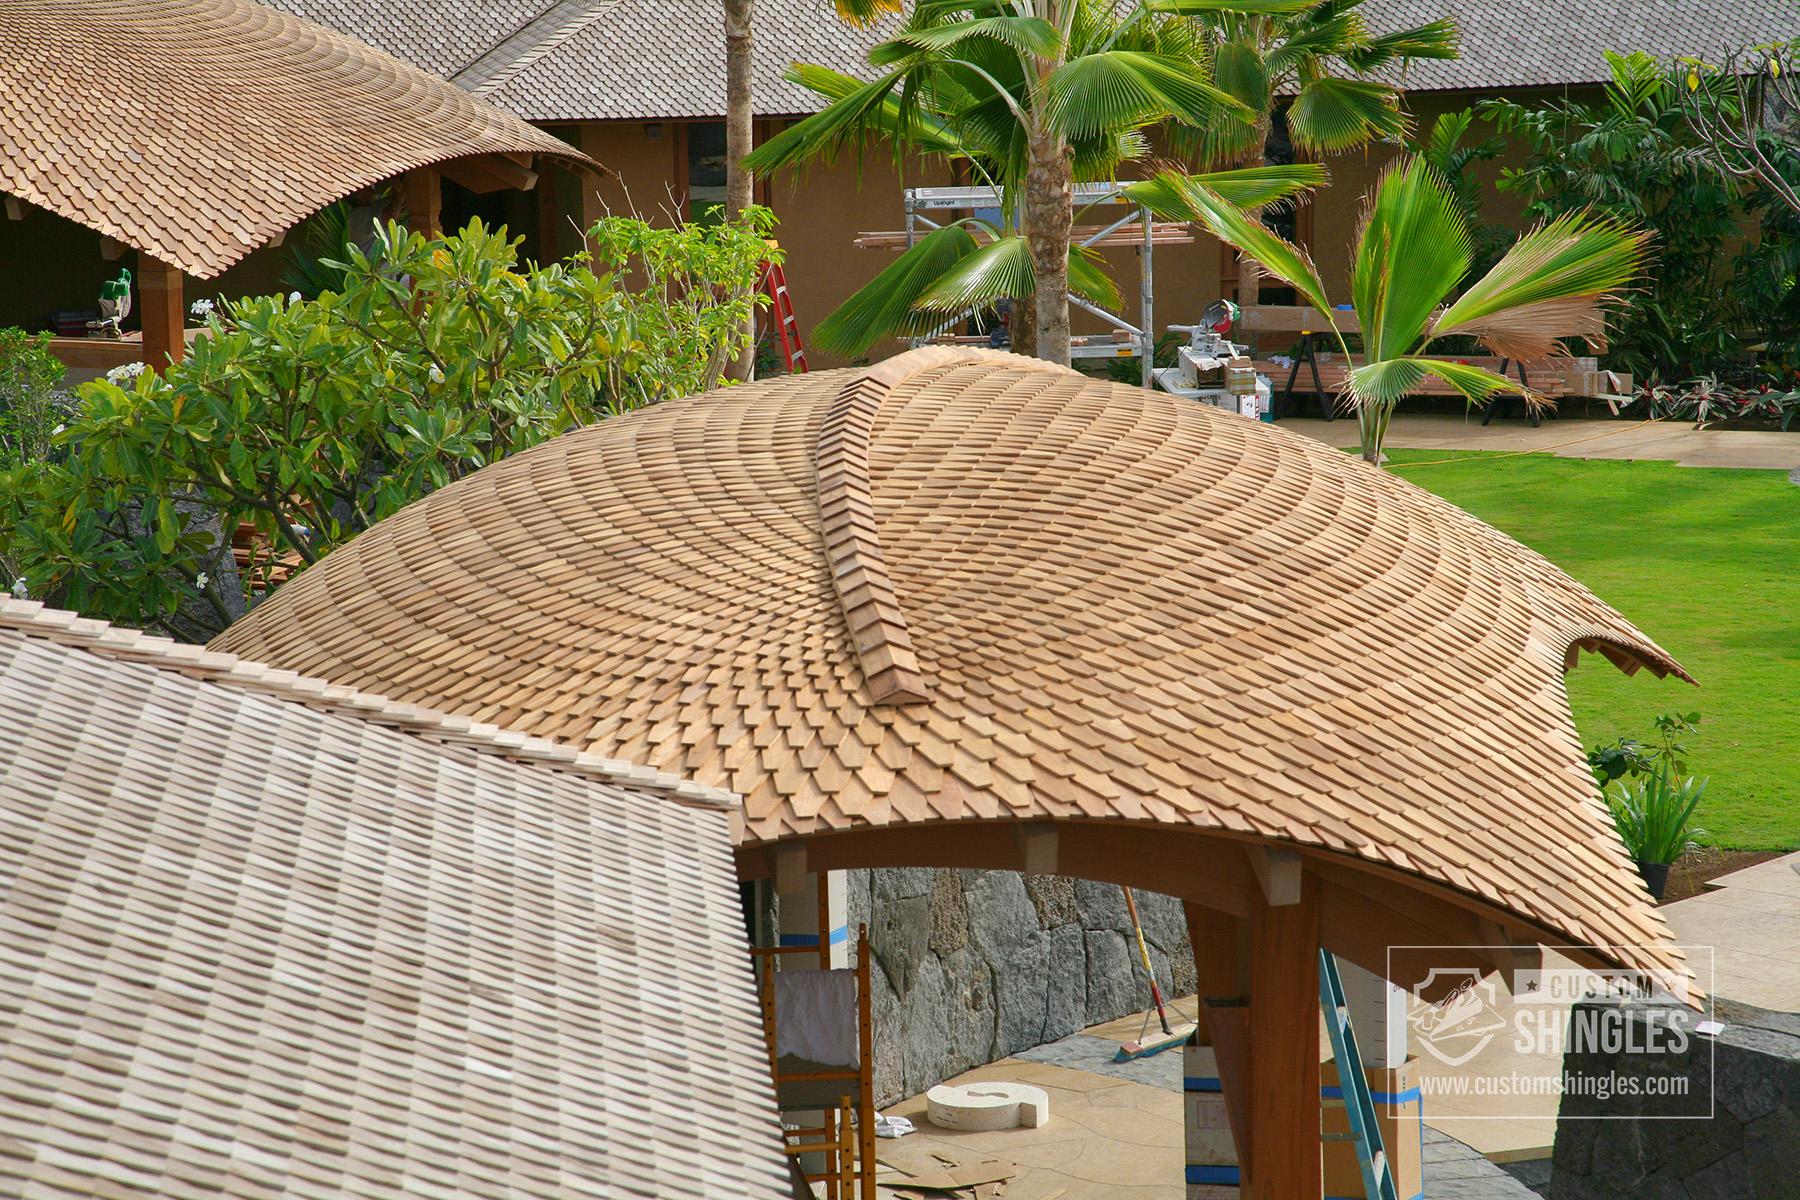 Kona,-Hawaii-Residence-with-Onsite-Steam-Bent-Teak-Shingles-(3).jpg